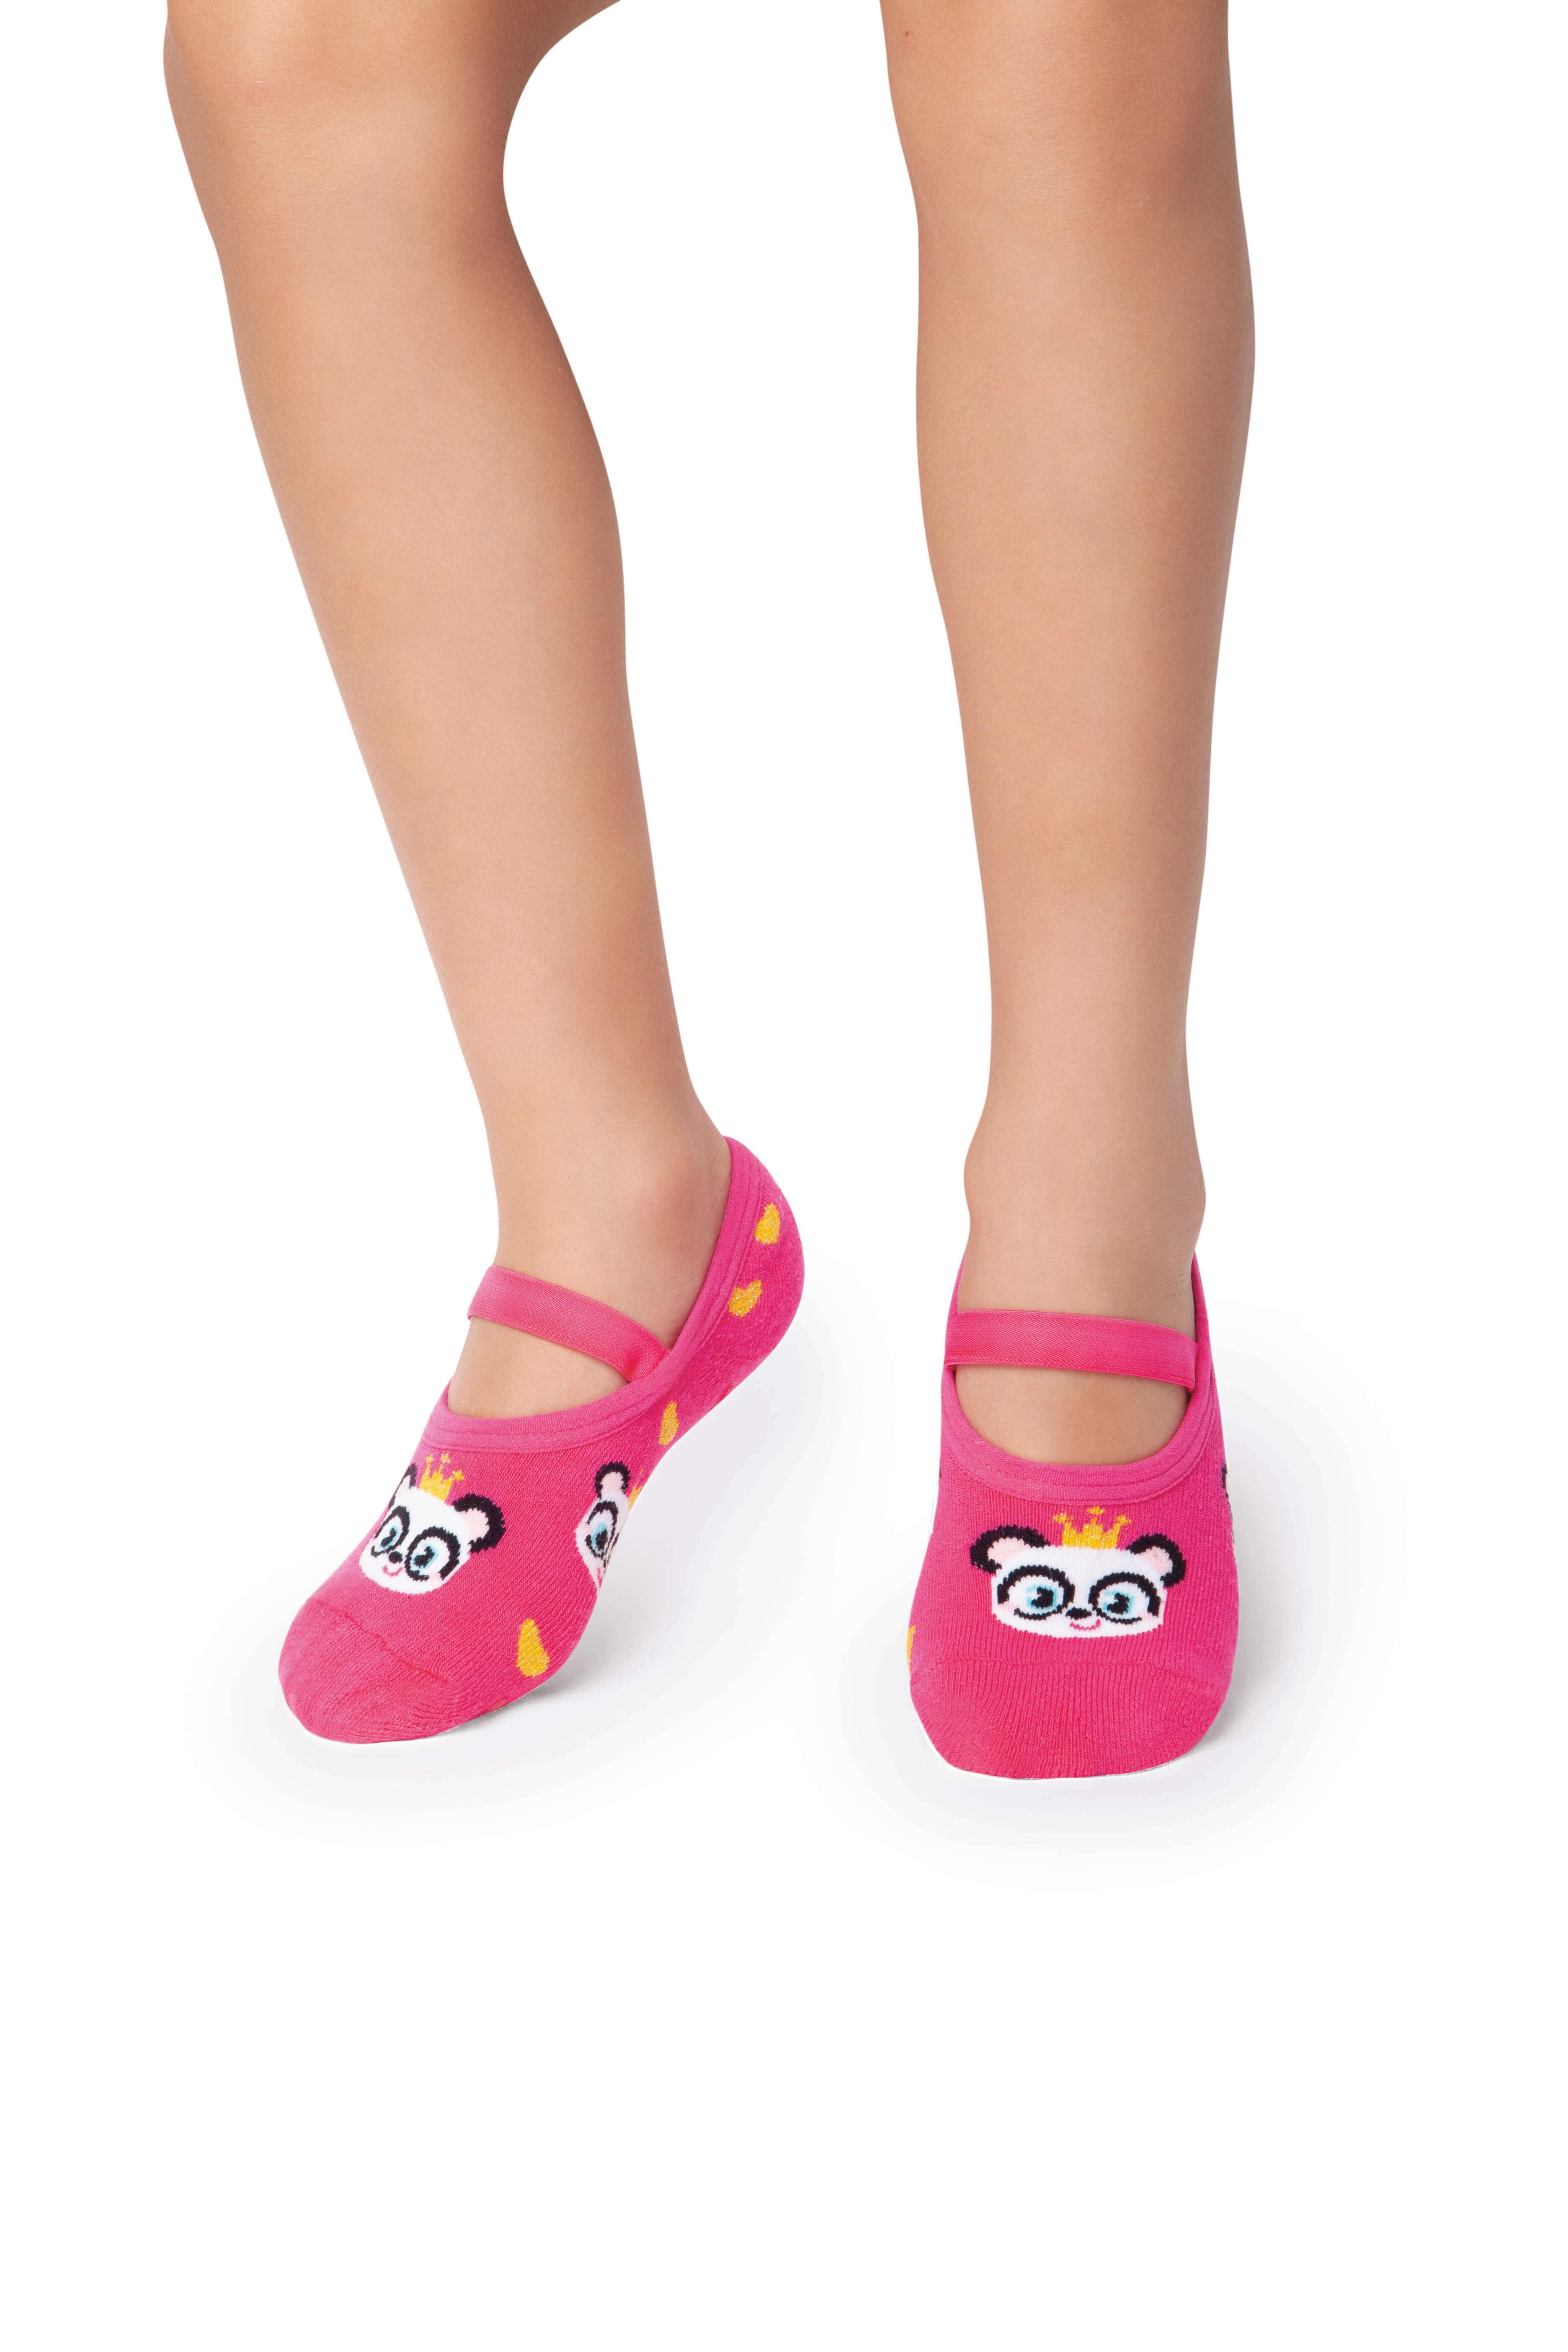 meia-sapatilha-boneca-rosa-fluor-23-a-27-puket